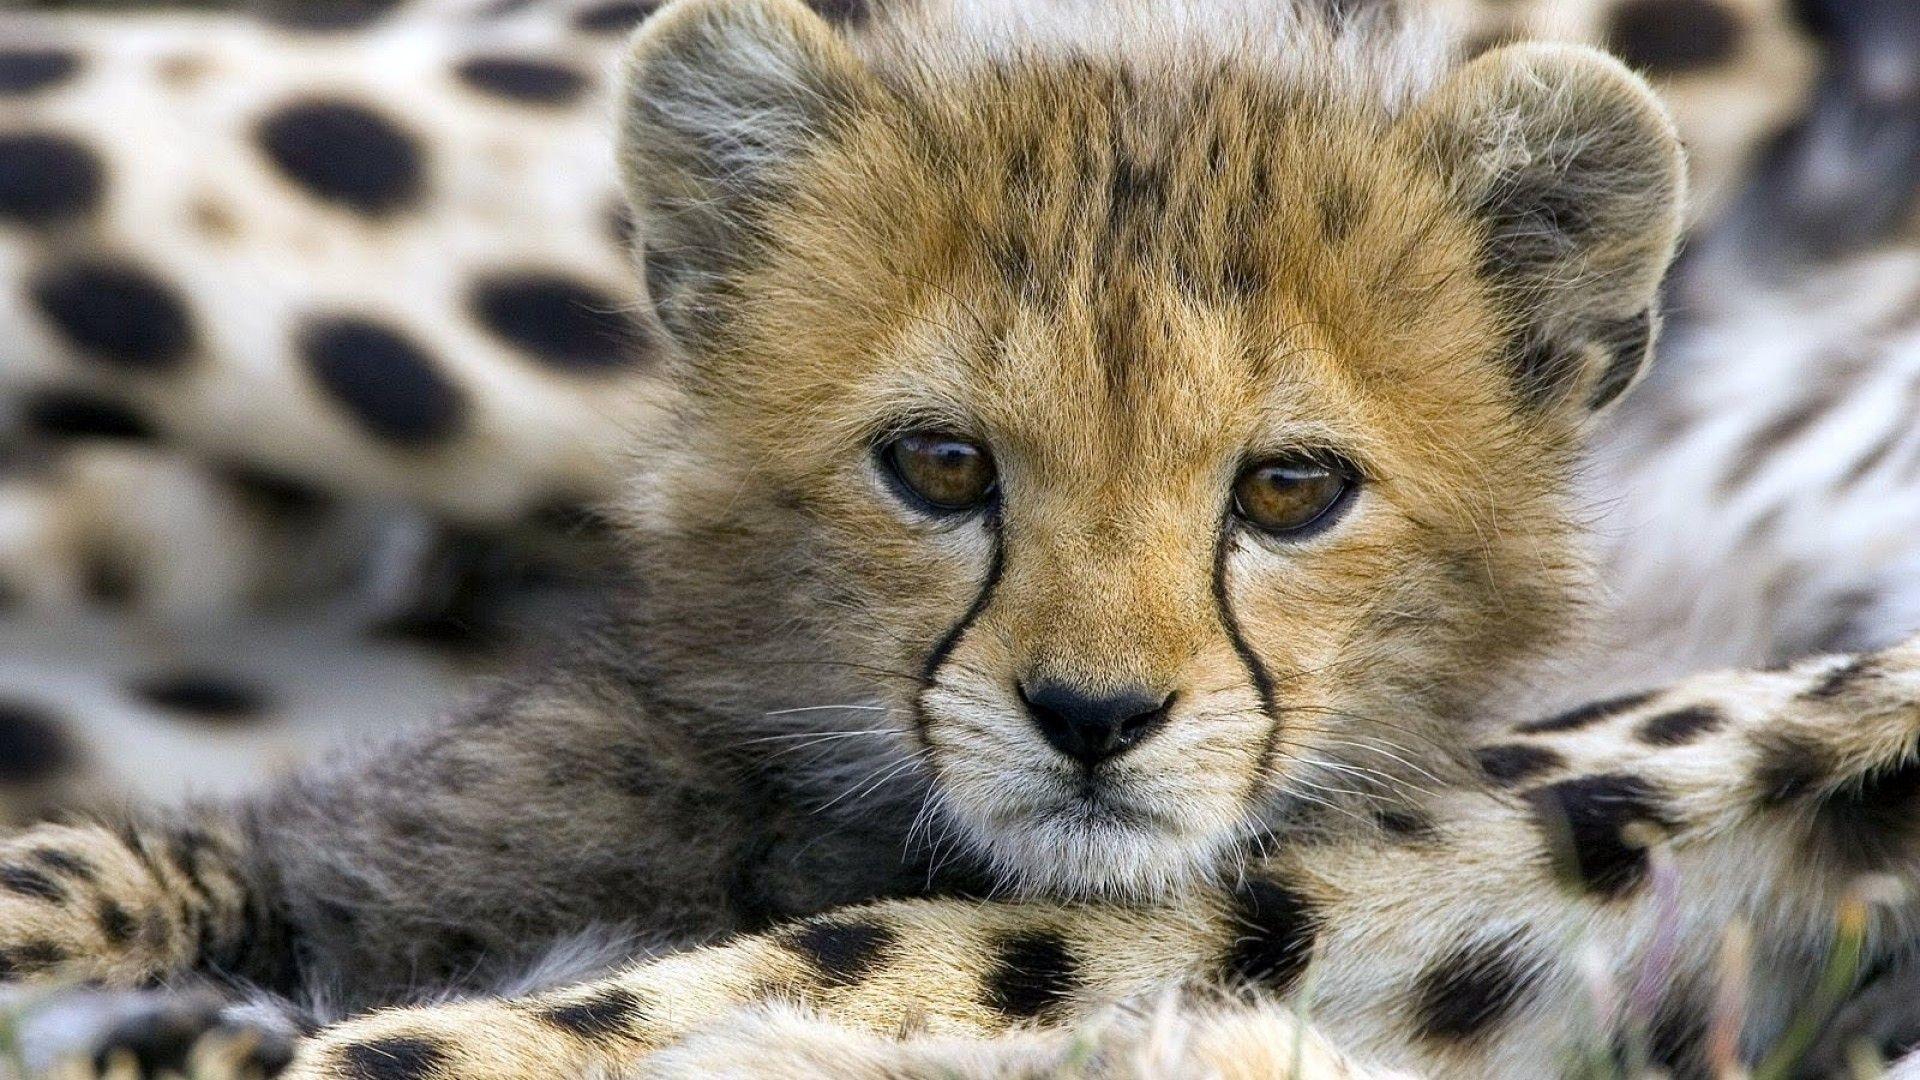 Res: 1920x1080, Baby Cheetah Wallpaper - wallpaper.